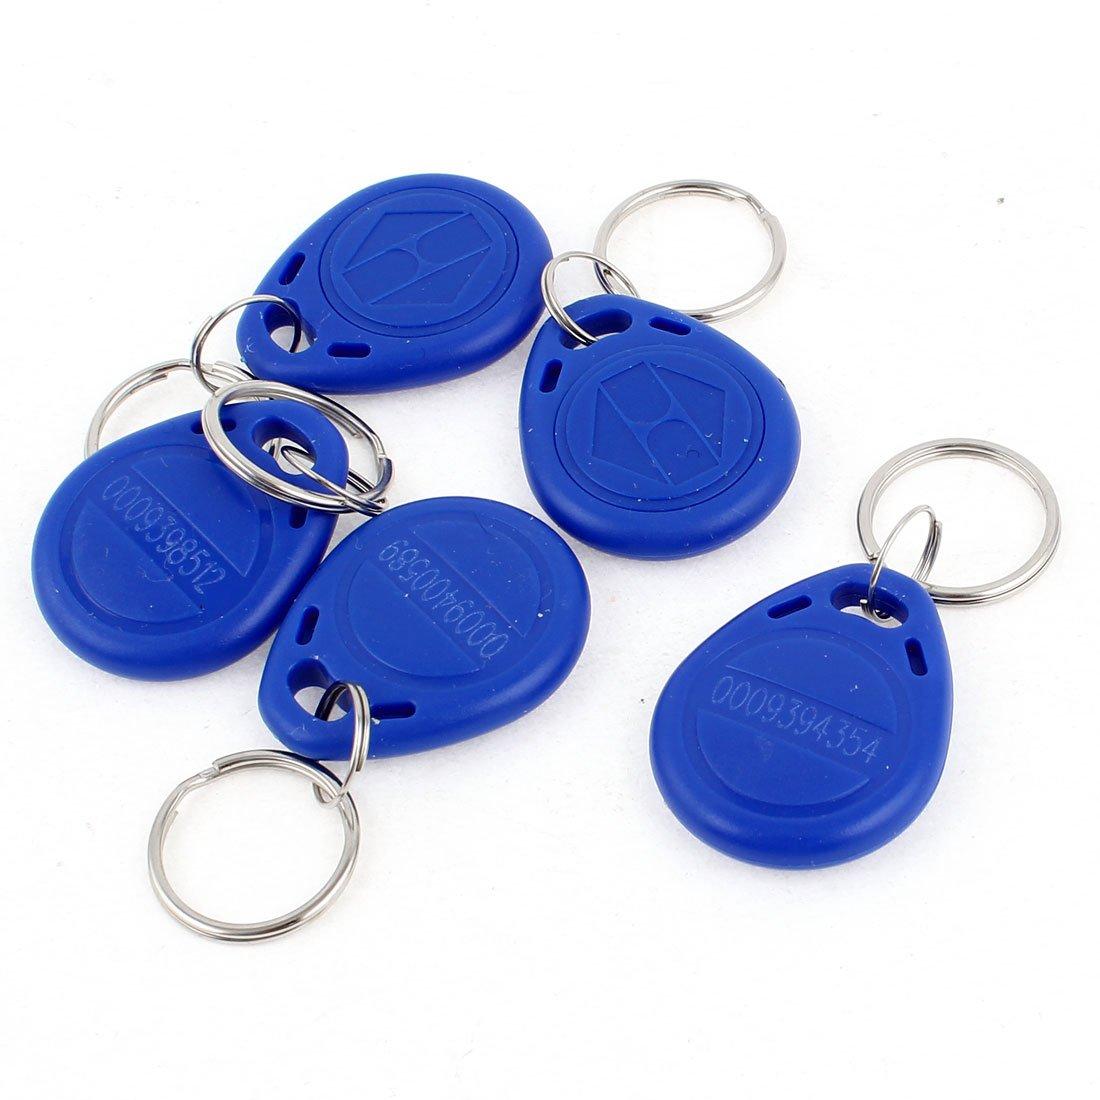 5 piezas EM4100 125Khz proximidad RFID ID Card etiquetas Llaveros etiqueta de azul